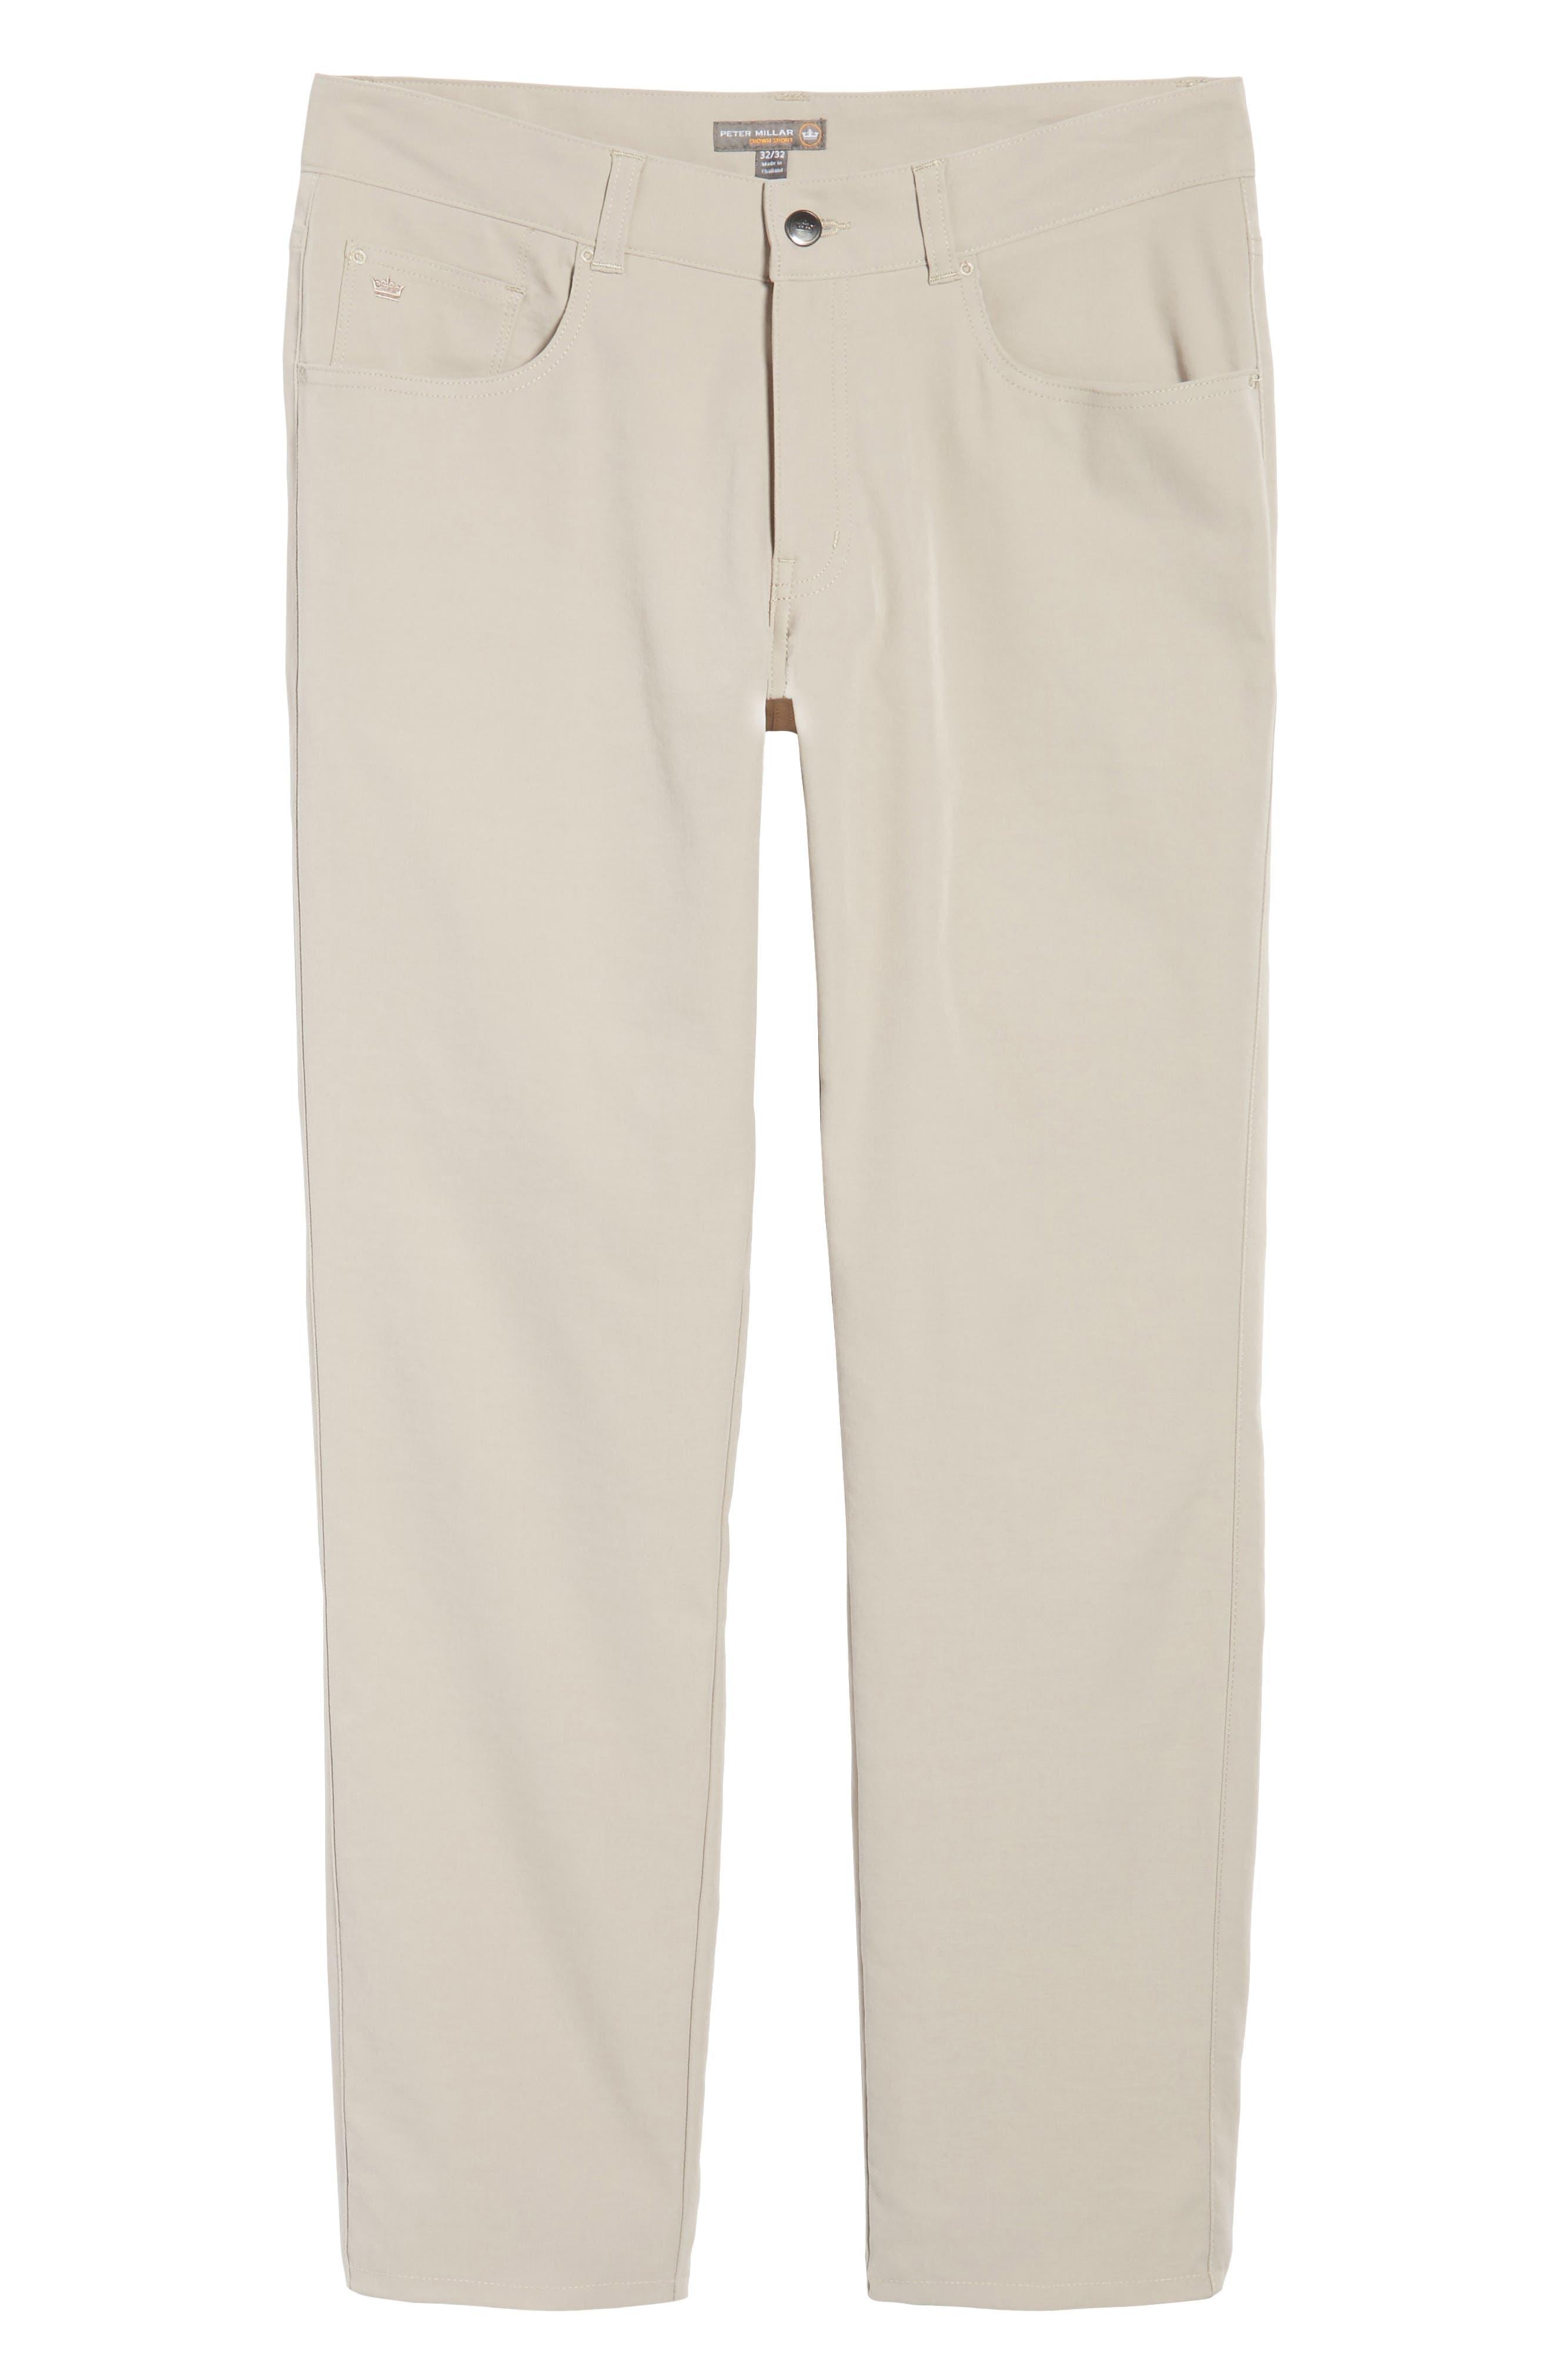 EB66 Performance Six-Pocket Pants,                             Alternate thumbnail 33, color,